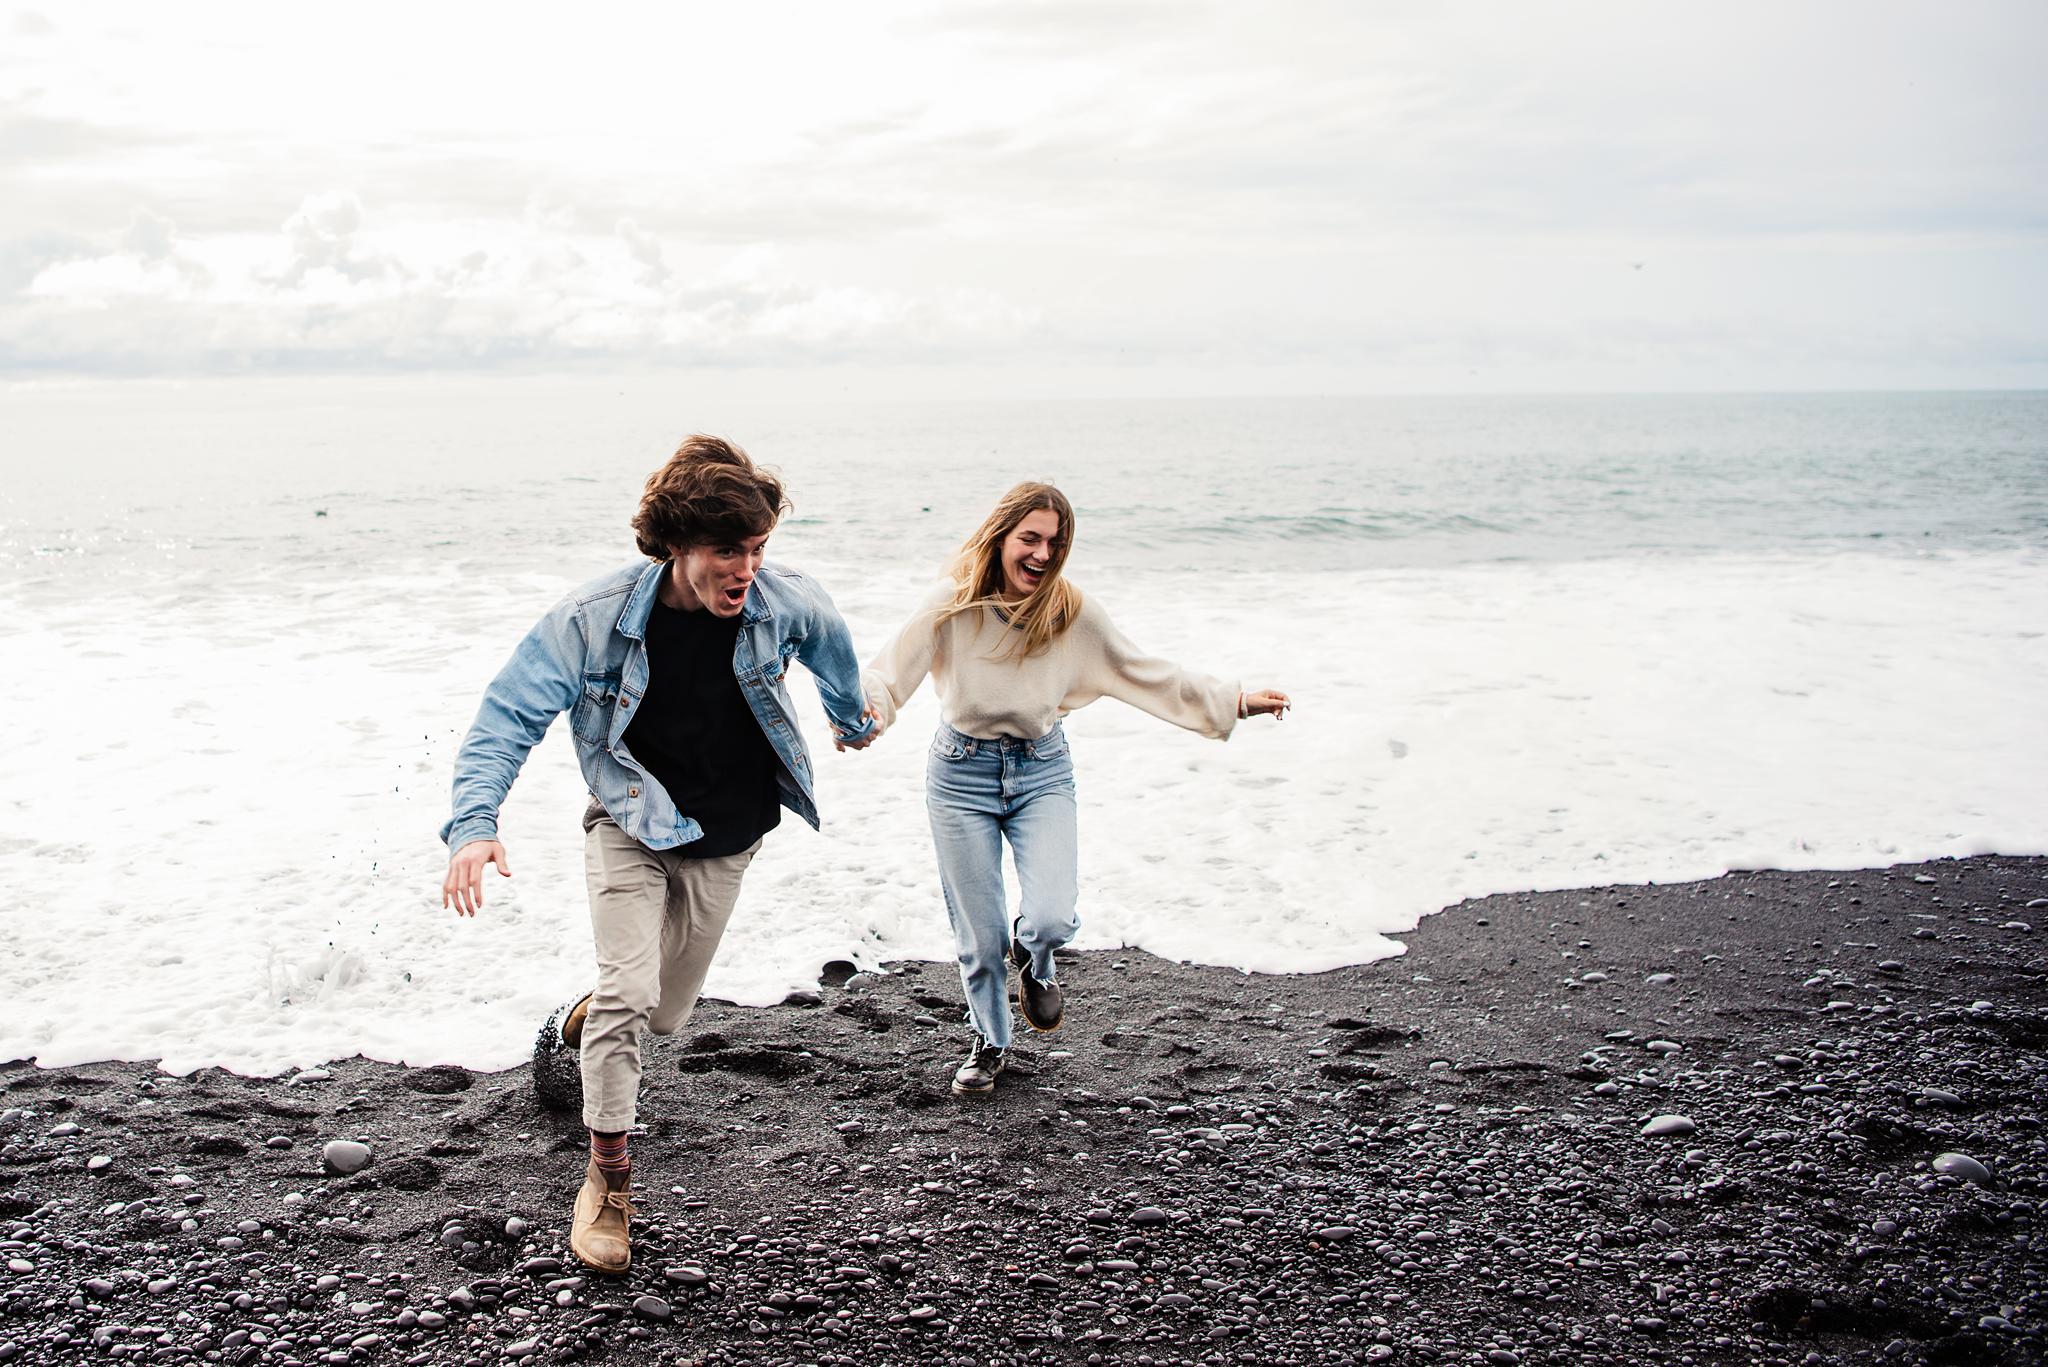 Iceland_Reynisfjara_Black_Sand_Beach_Couples_Session_JILL_STUDIO_Rochester_NY_Photographer_DSC_9713.jpg